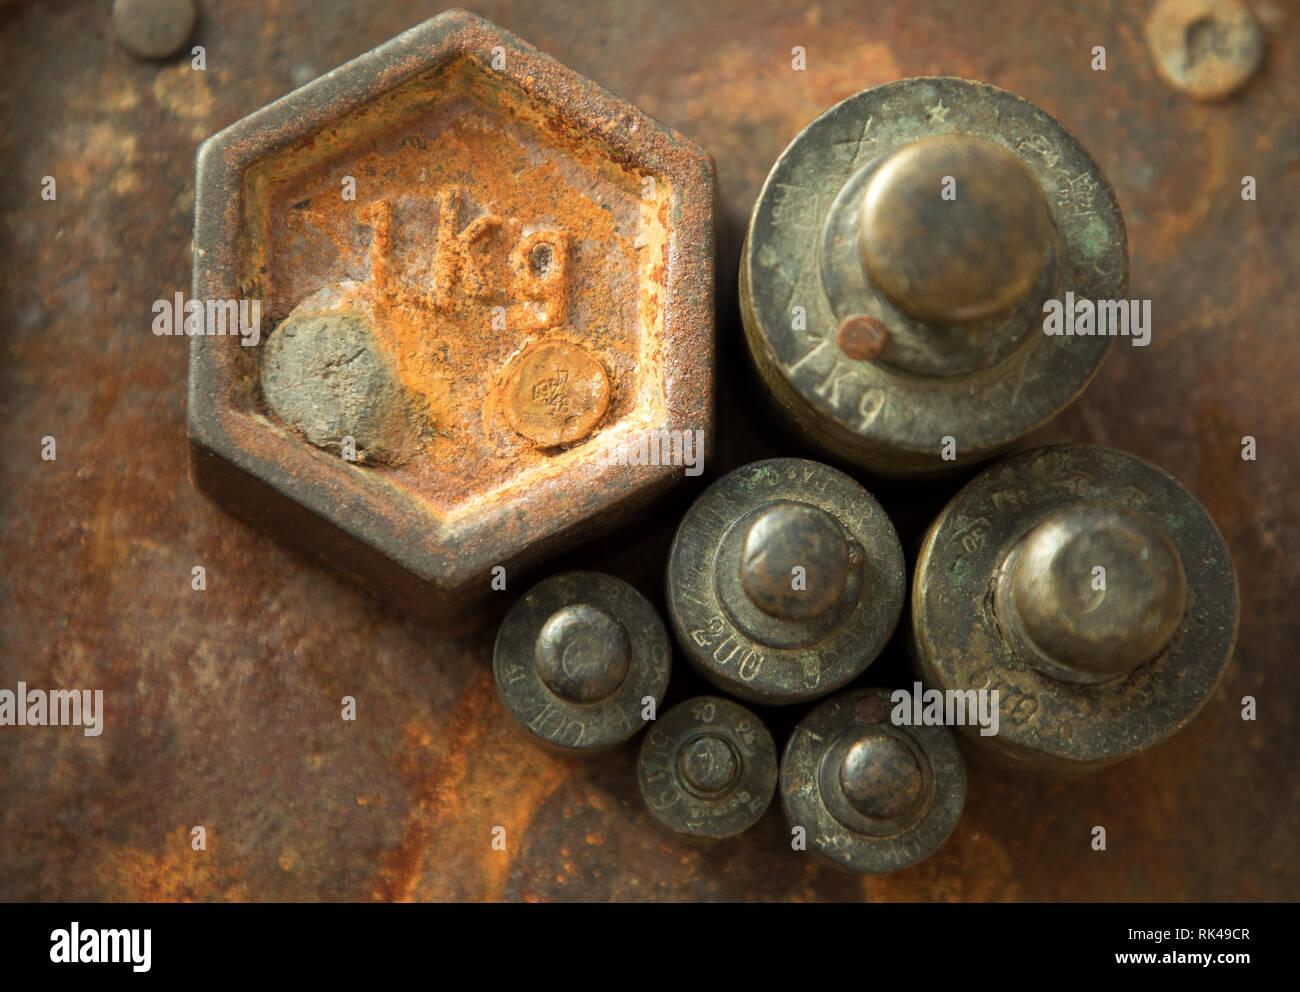 Pesi per bilance retrò. Vintage peso per una bilancia, bilanciamento dei pesi. Foto Stock